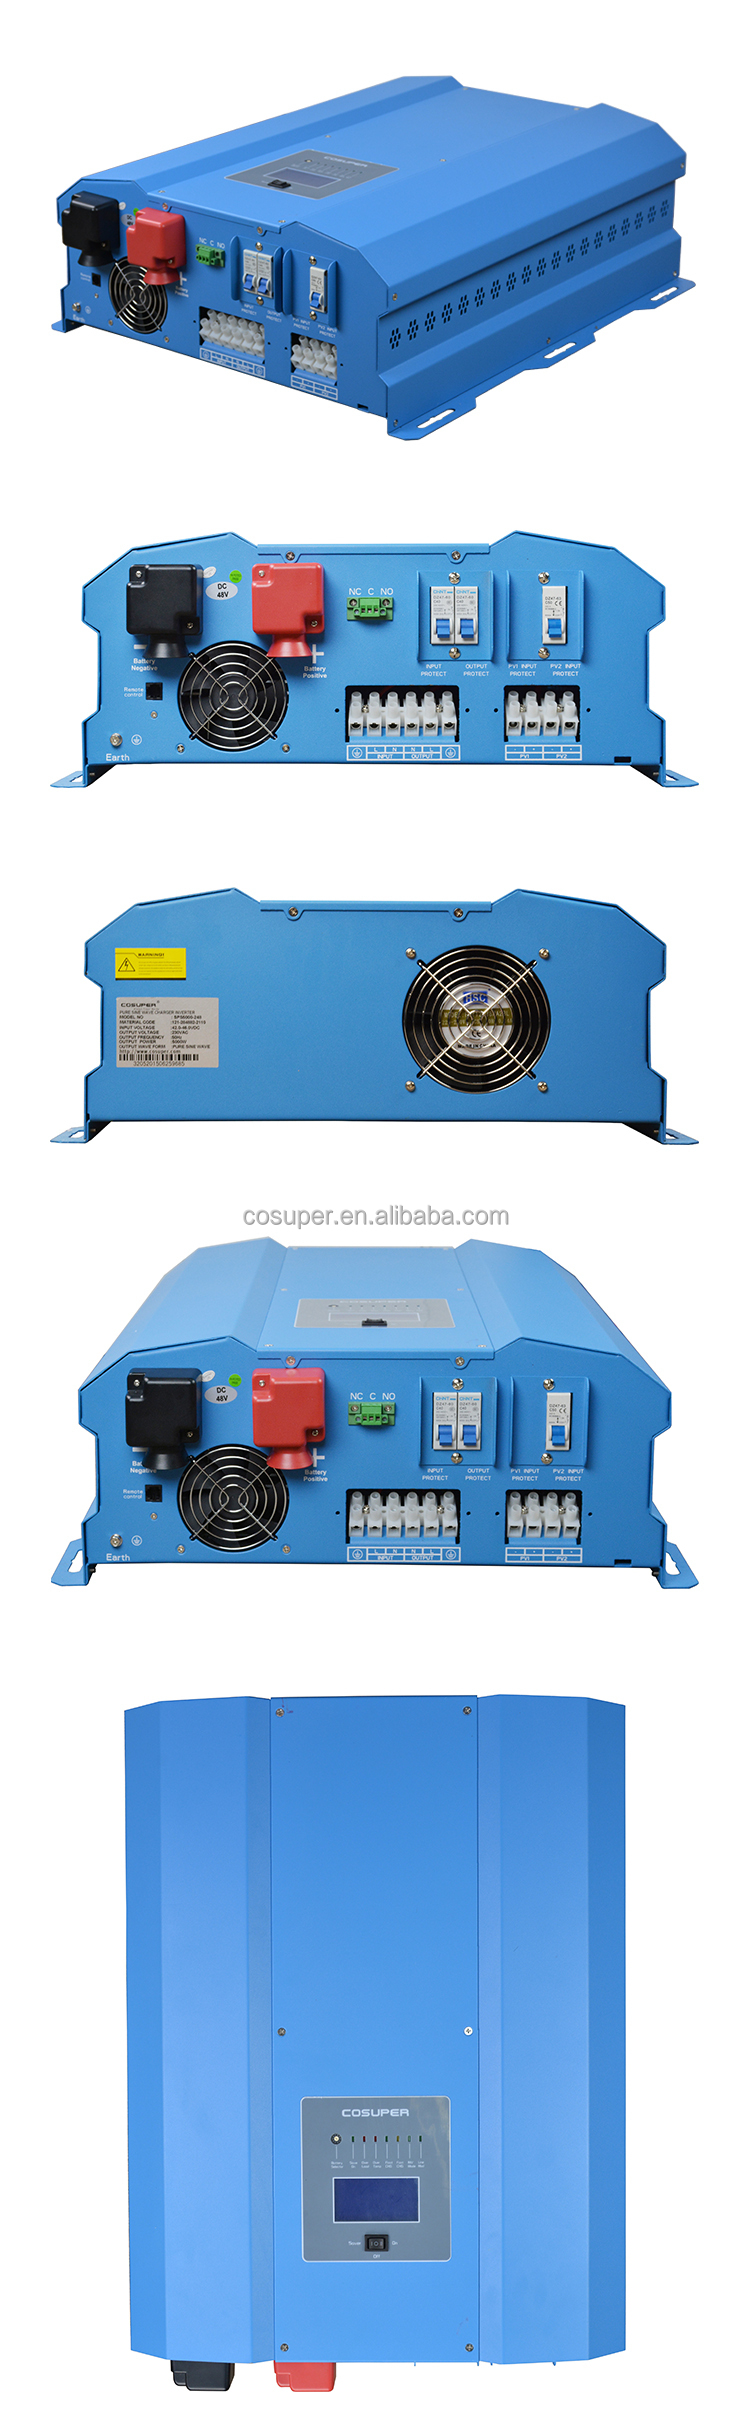 8000w Power Inverter Dc 12v Ac 220v Circuit Diagram 48v Pure Also Sine Wave Solar